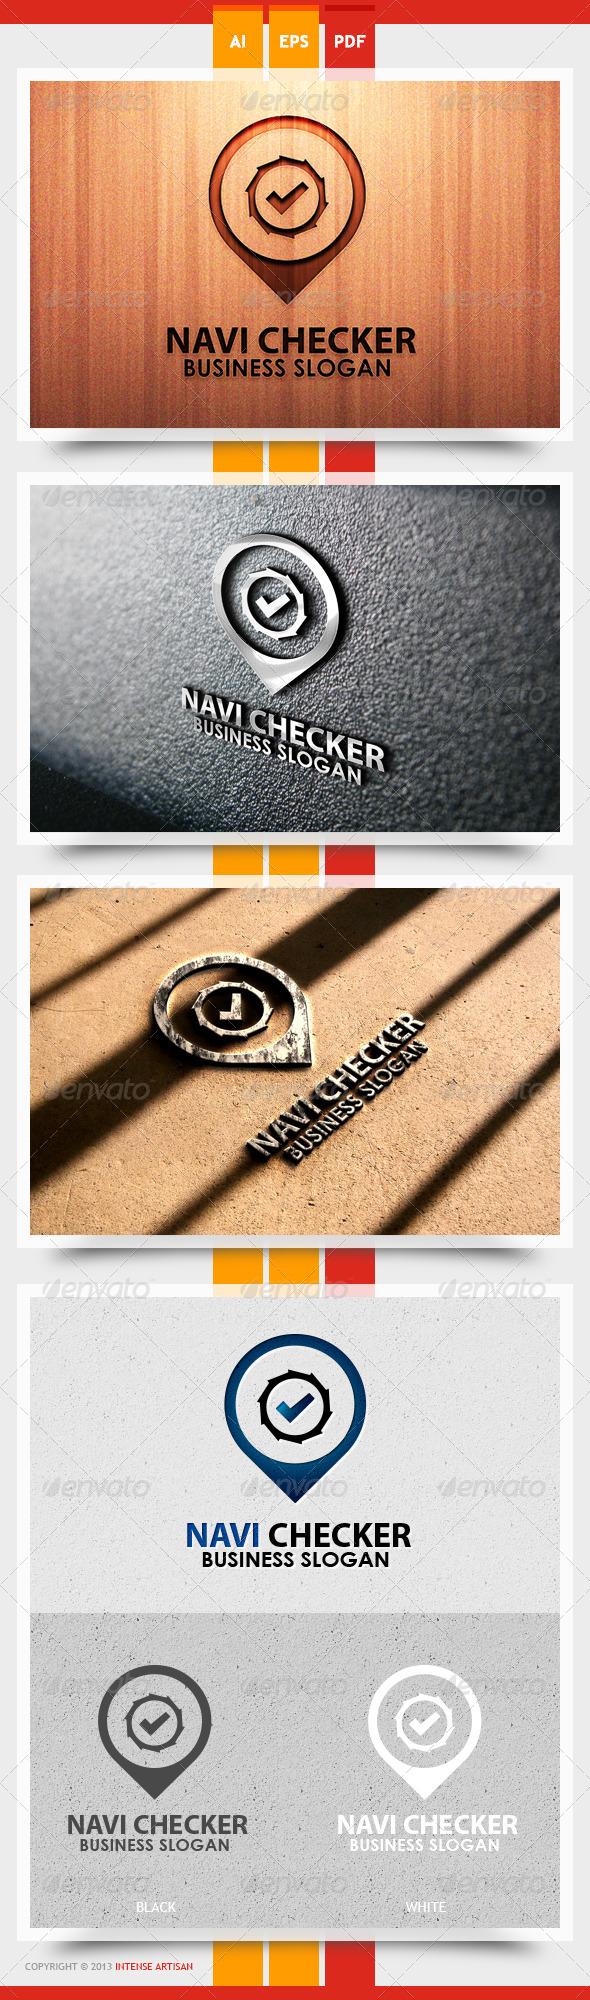 Navi Checker Logo Template - Objects Logo Templates